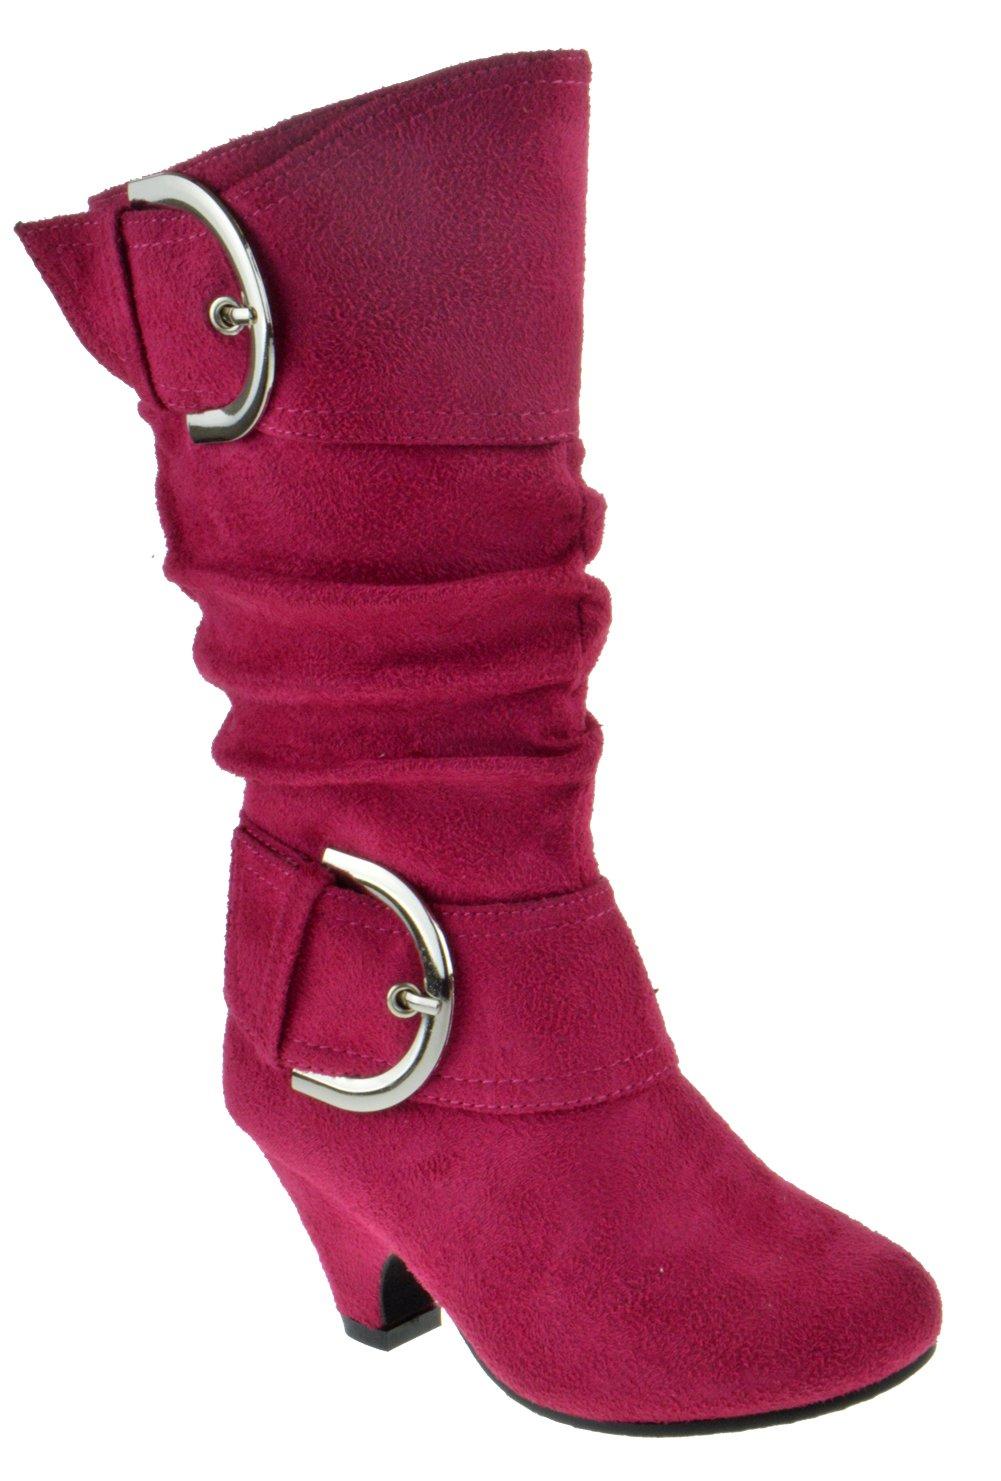 Auto 8K Little Girls Buckle Knee High Dress Boots Fushia 10